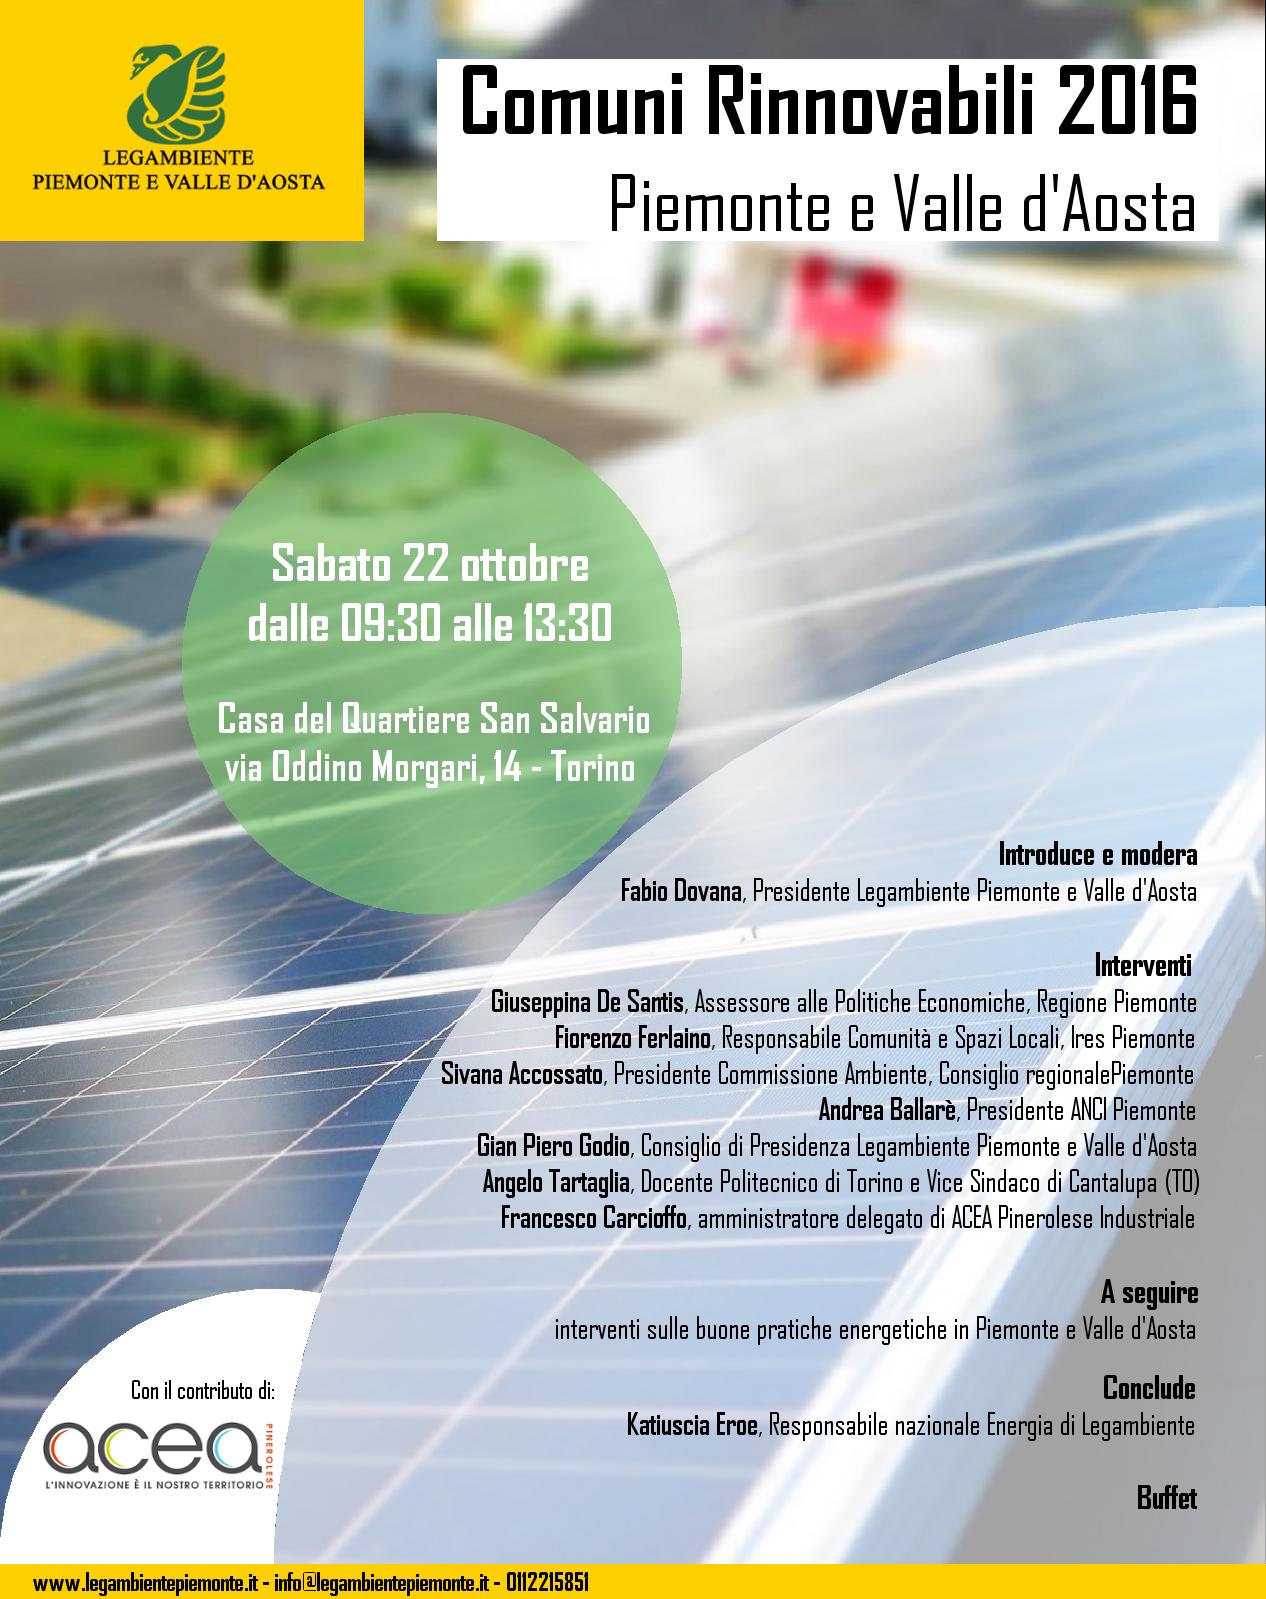 Comuni Rinnovabili 2016 Piemonte e Valle d'Aosta. Appuntamento sabato 22 ottobre